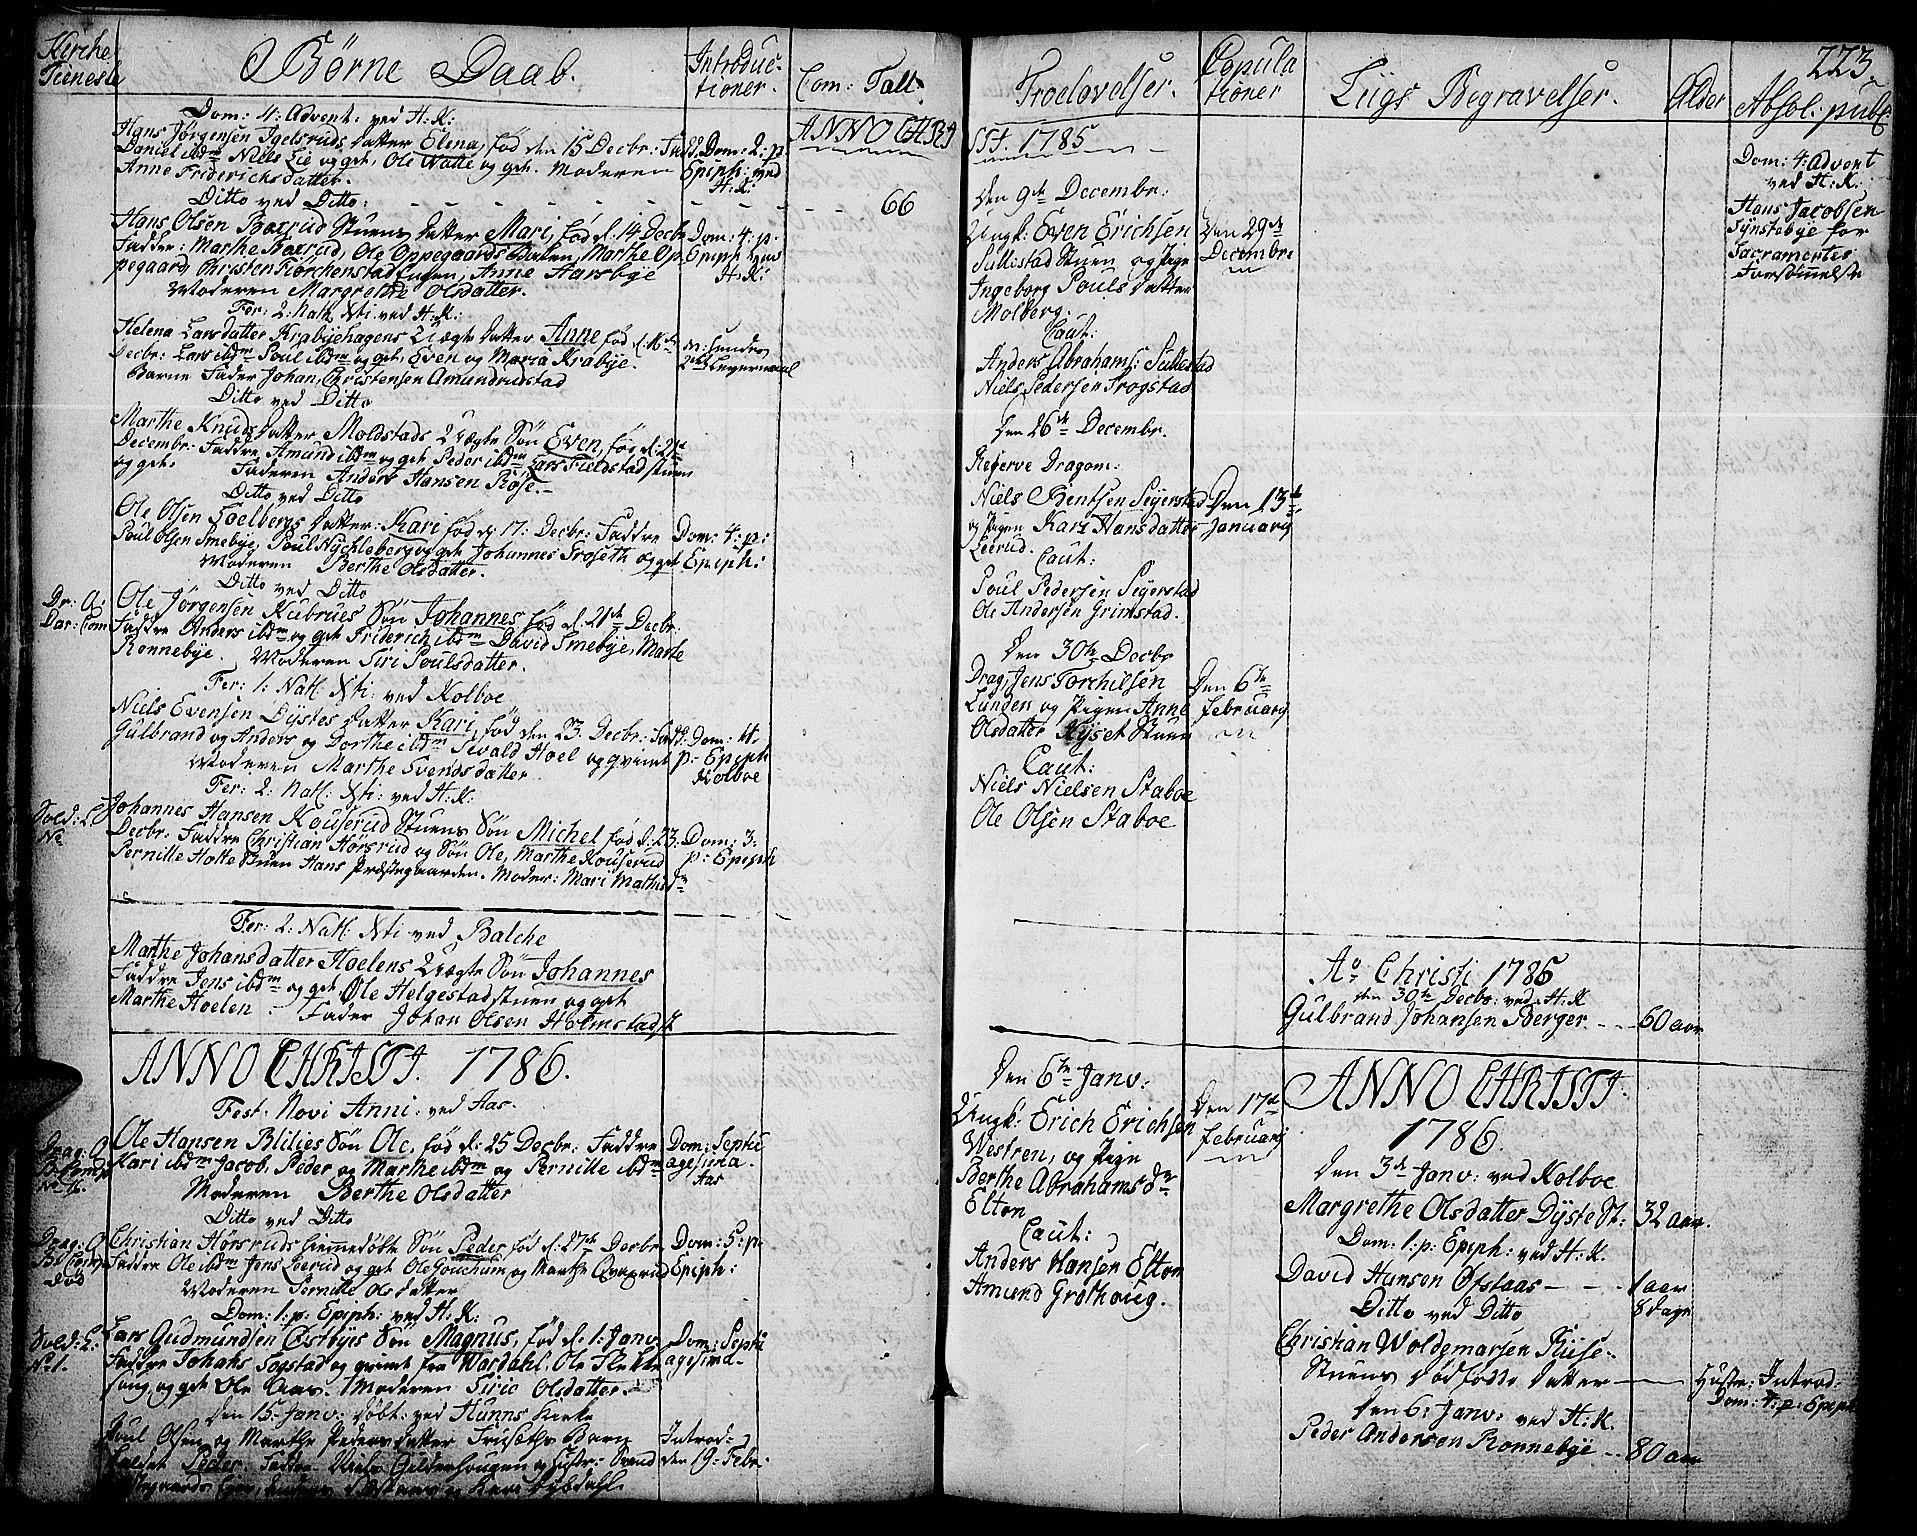 SAH, Toten prestekontor, Ministerialbok nr. 6, 1773-1793, s. 223